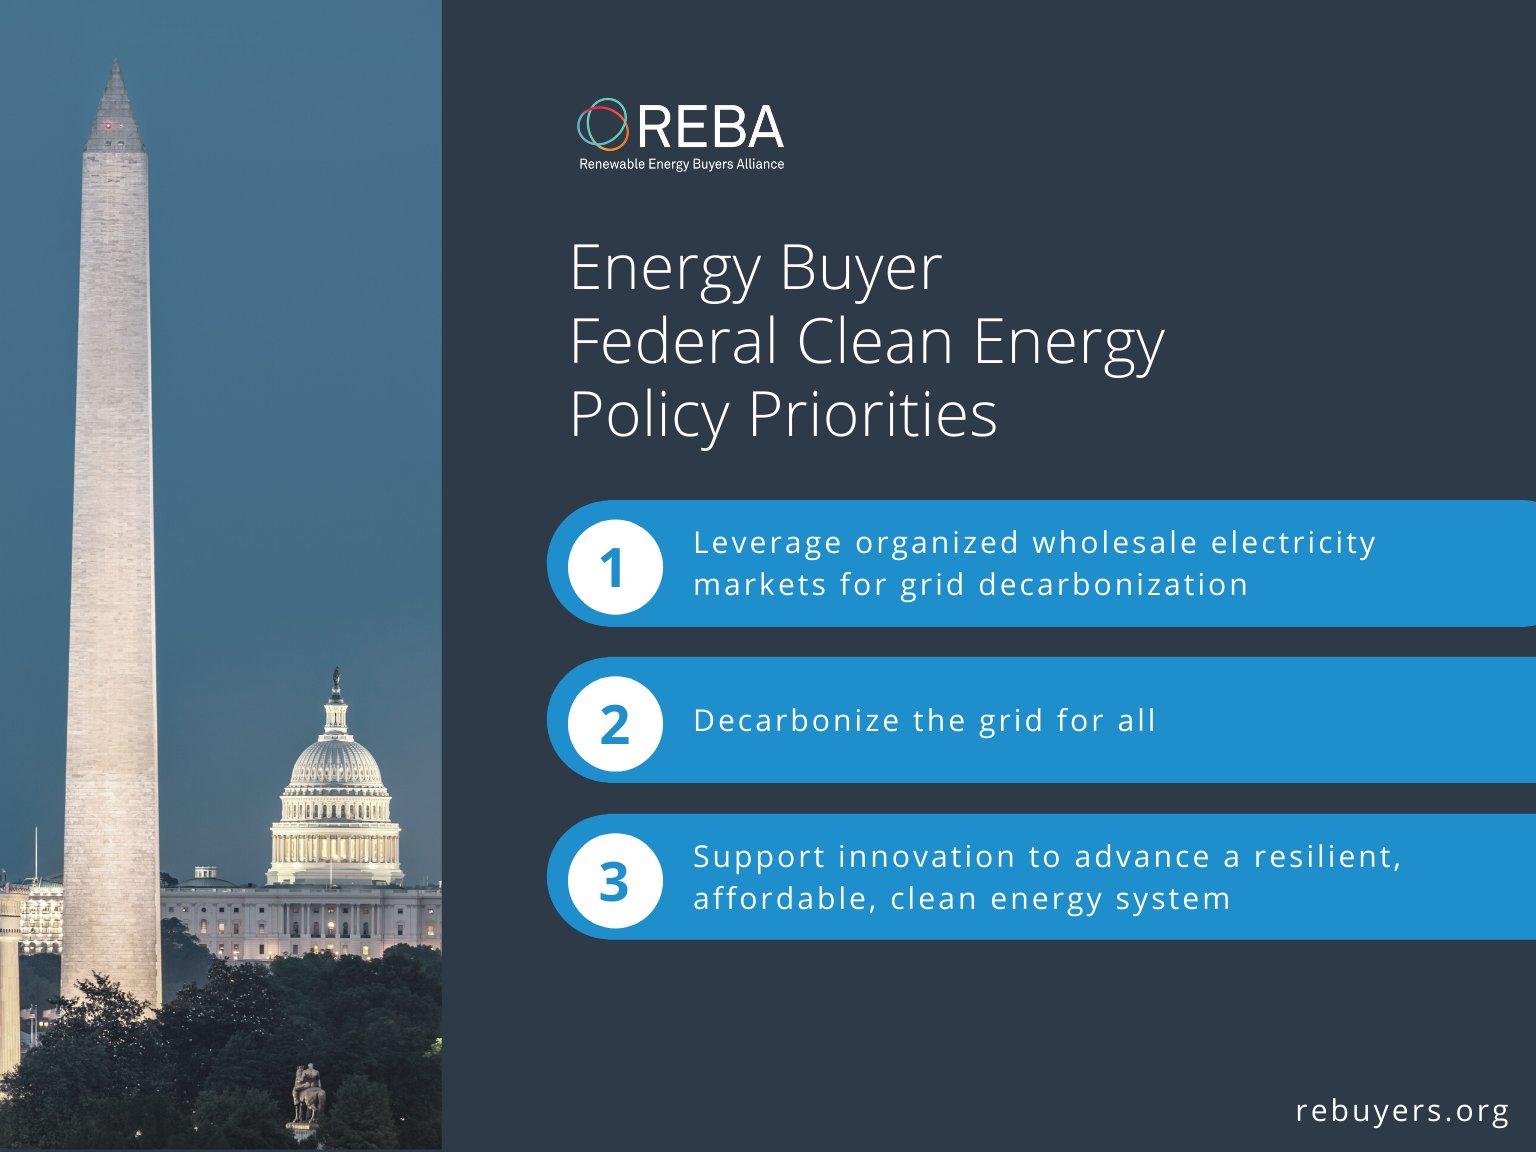 REBA Energy Buyer Federal Clean Energy Policy Statement 2021